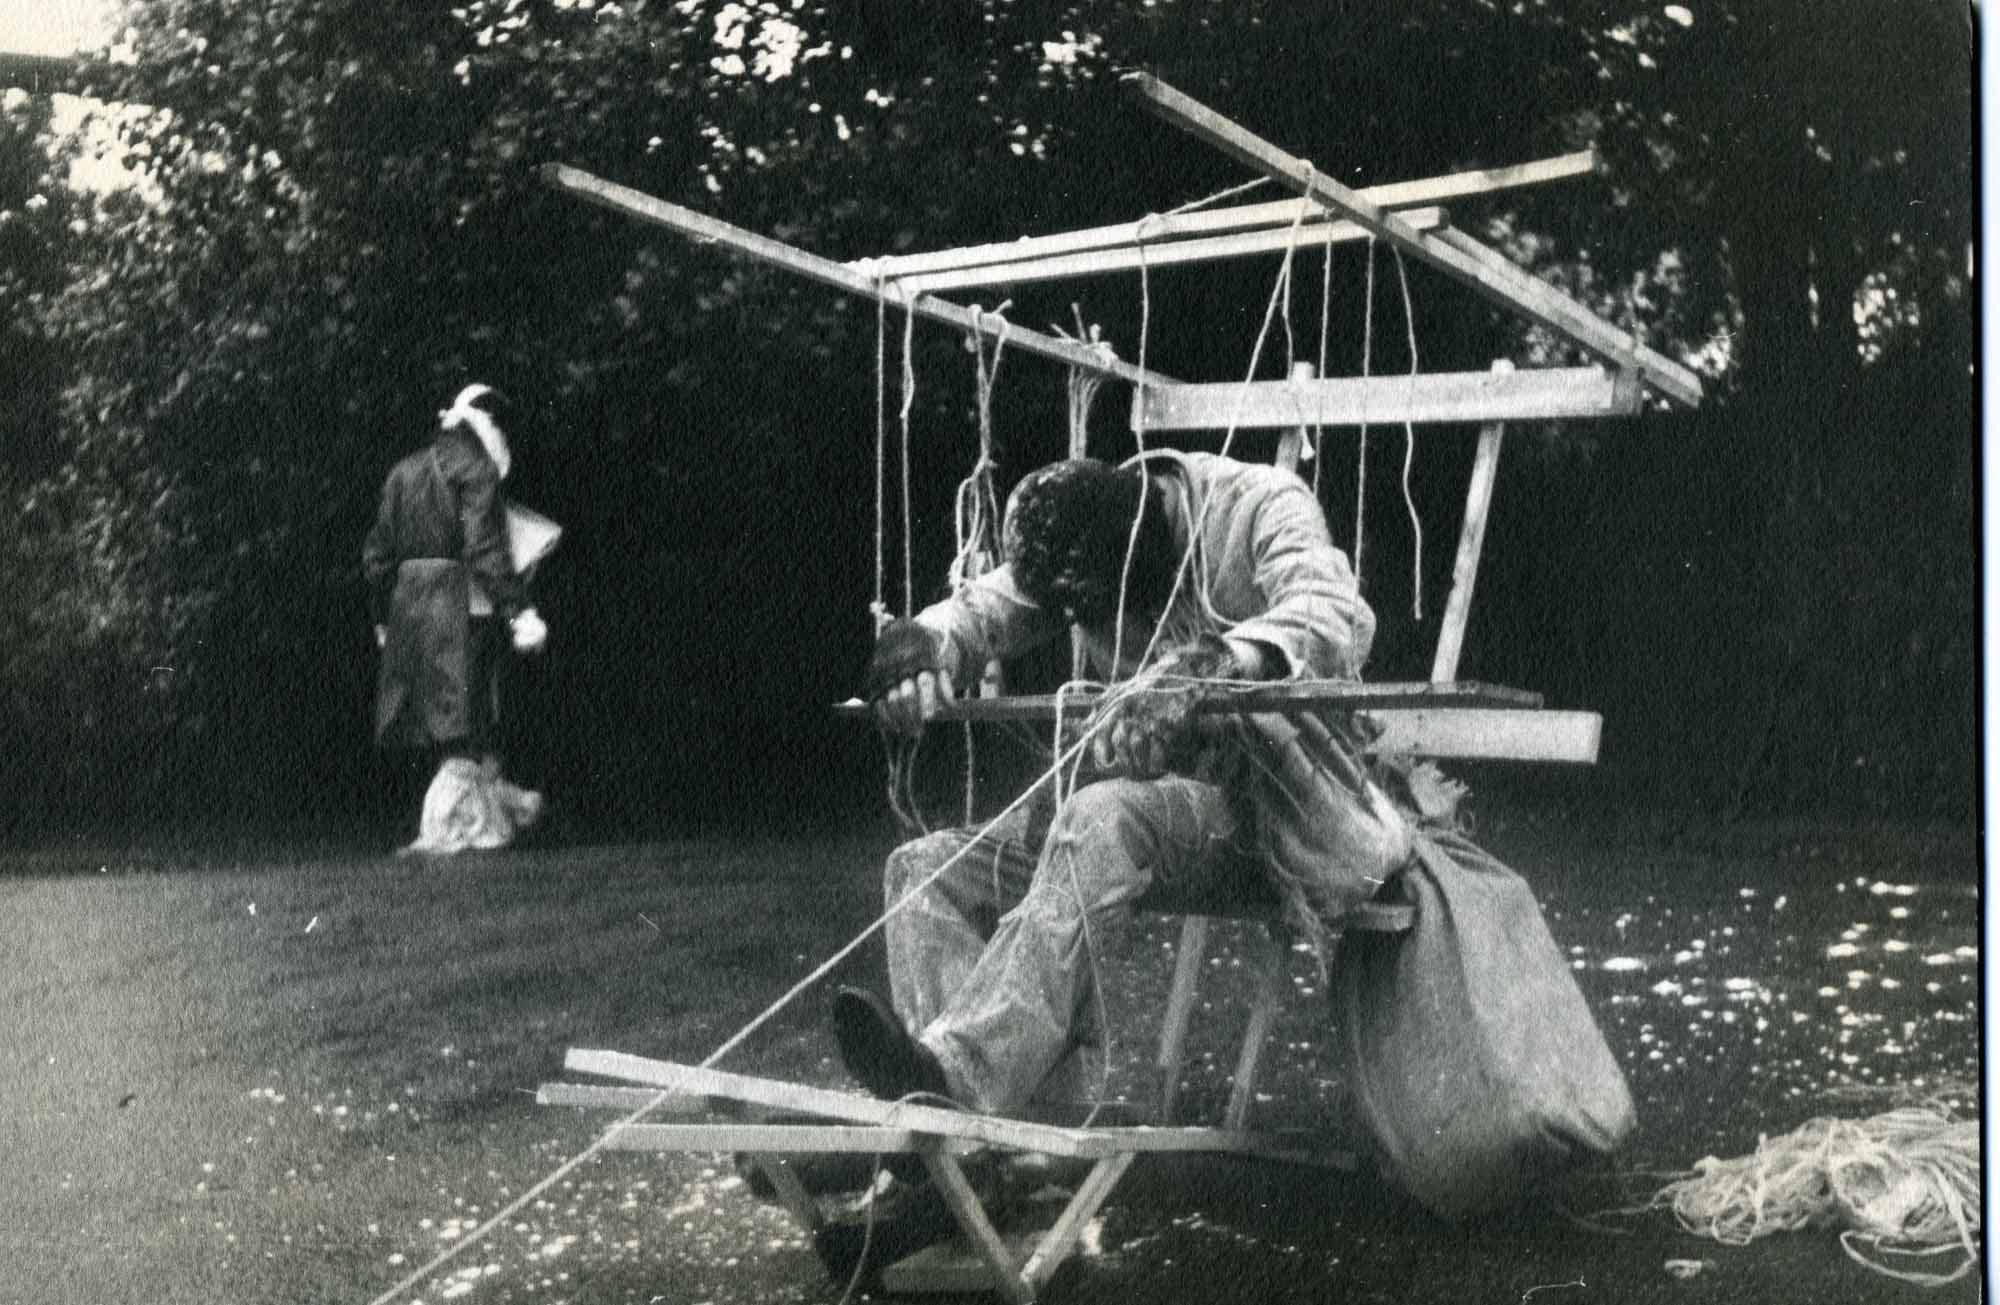 Richard Layzell, NNYN (No no yah no) , 1970, Regents Park, London. Photo by Mavis Taylor